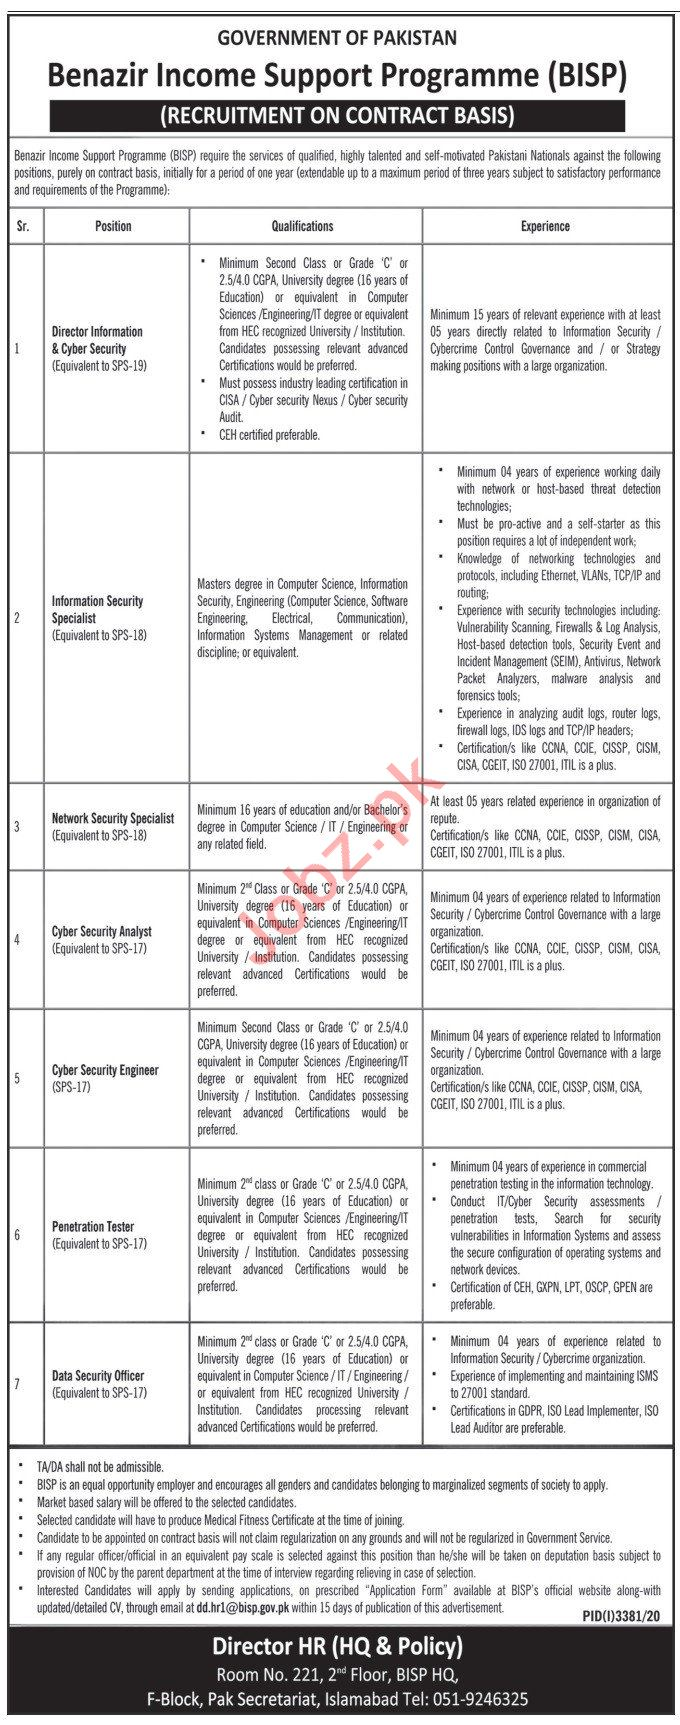 BISP Islamabad Jobs 2021 for Director & Security Specialist